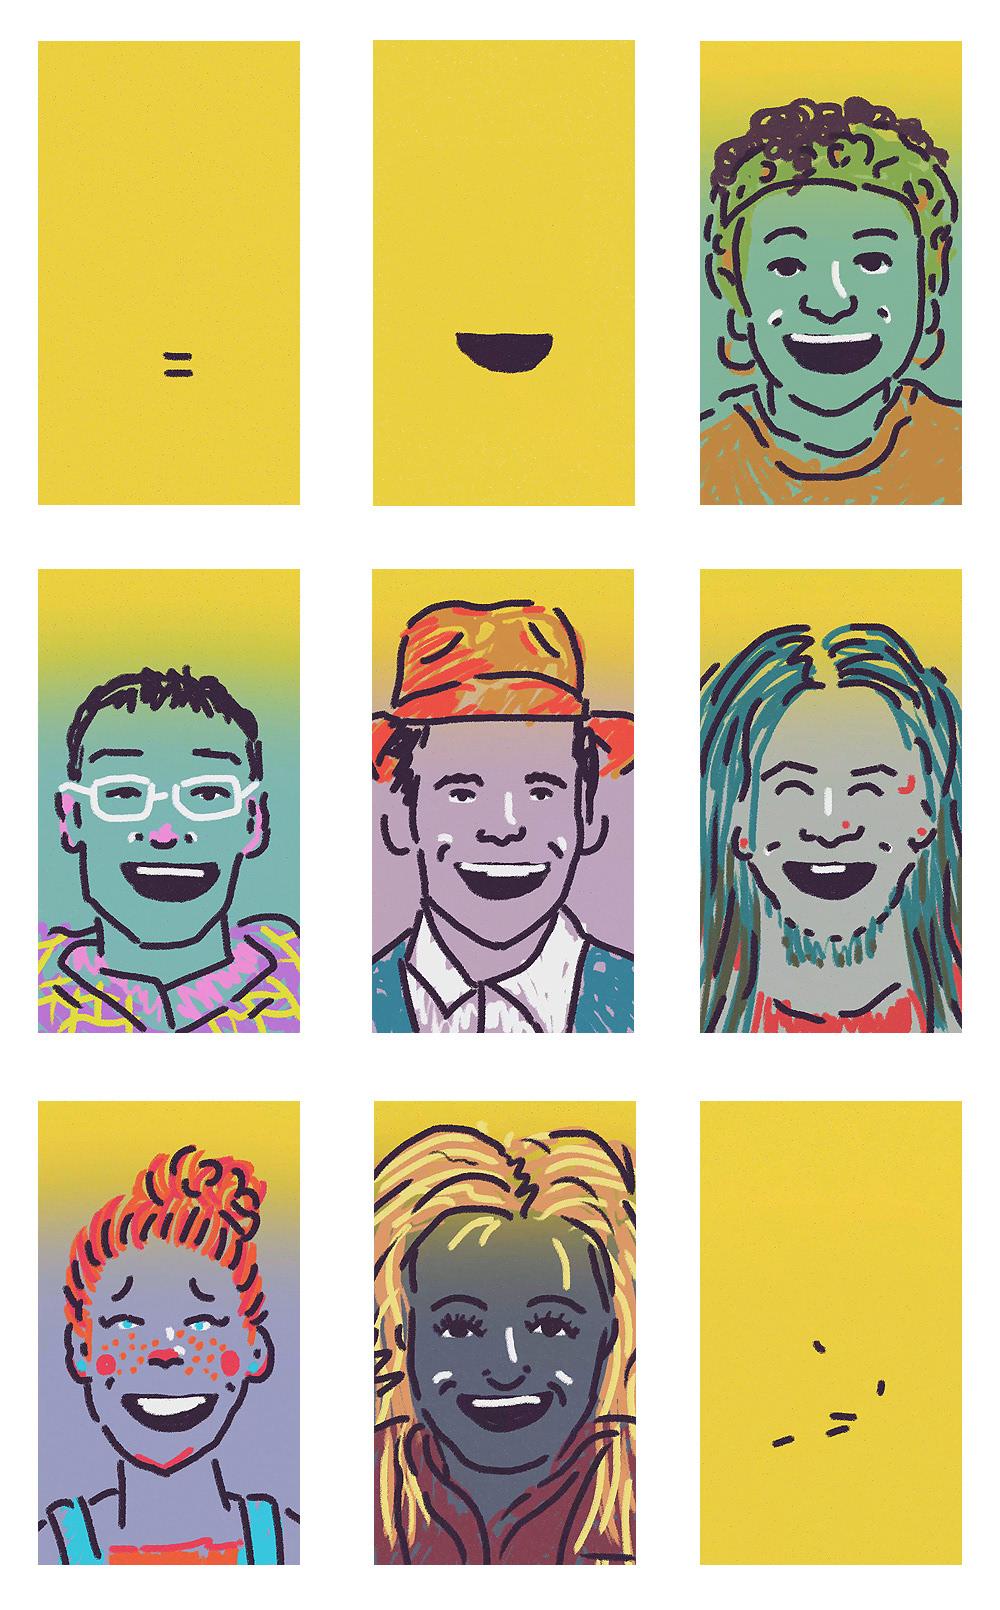 animacion equality igualdad people poster smile sonrisa